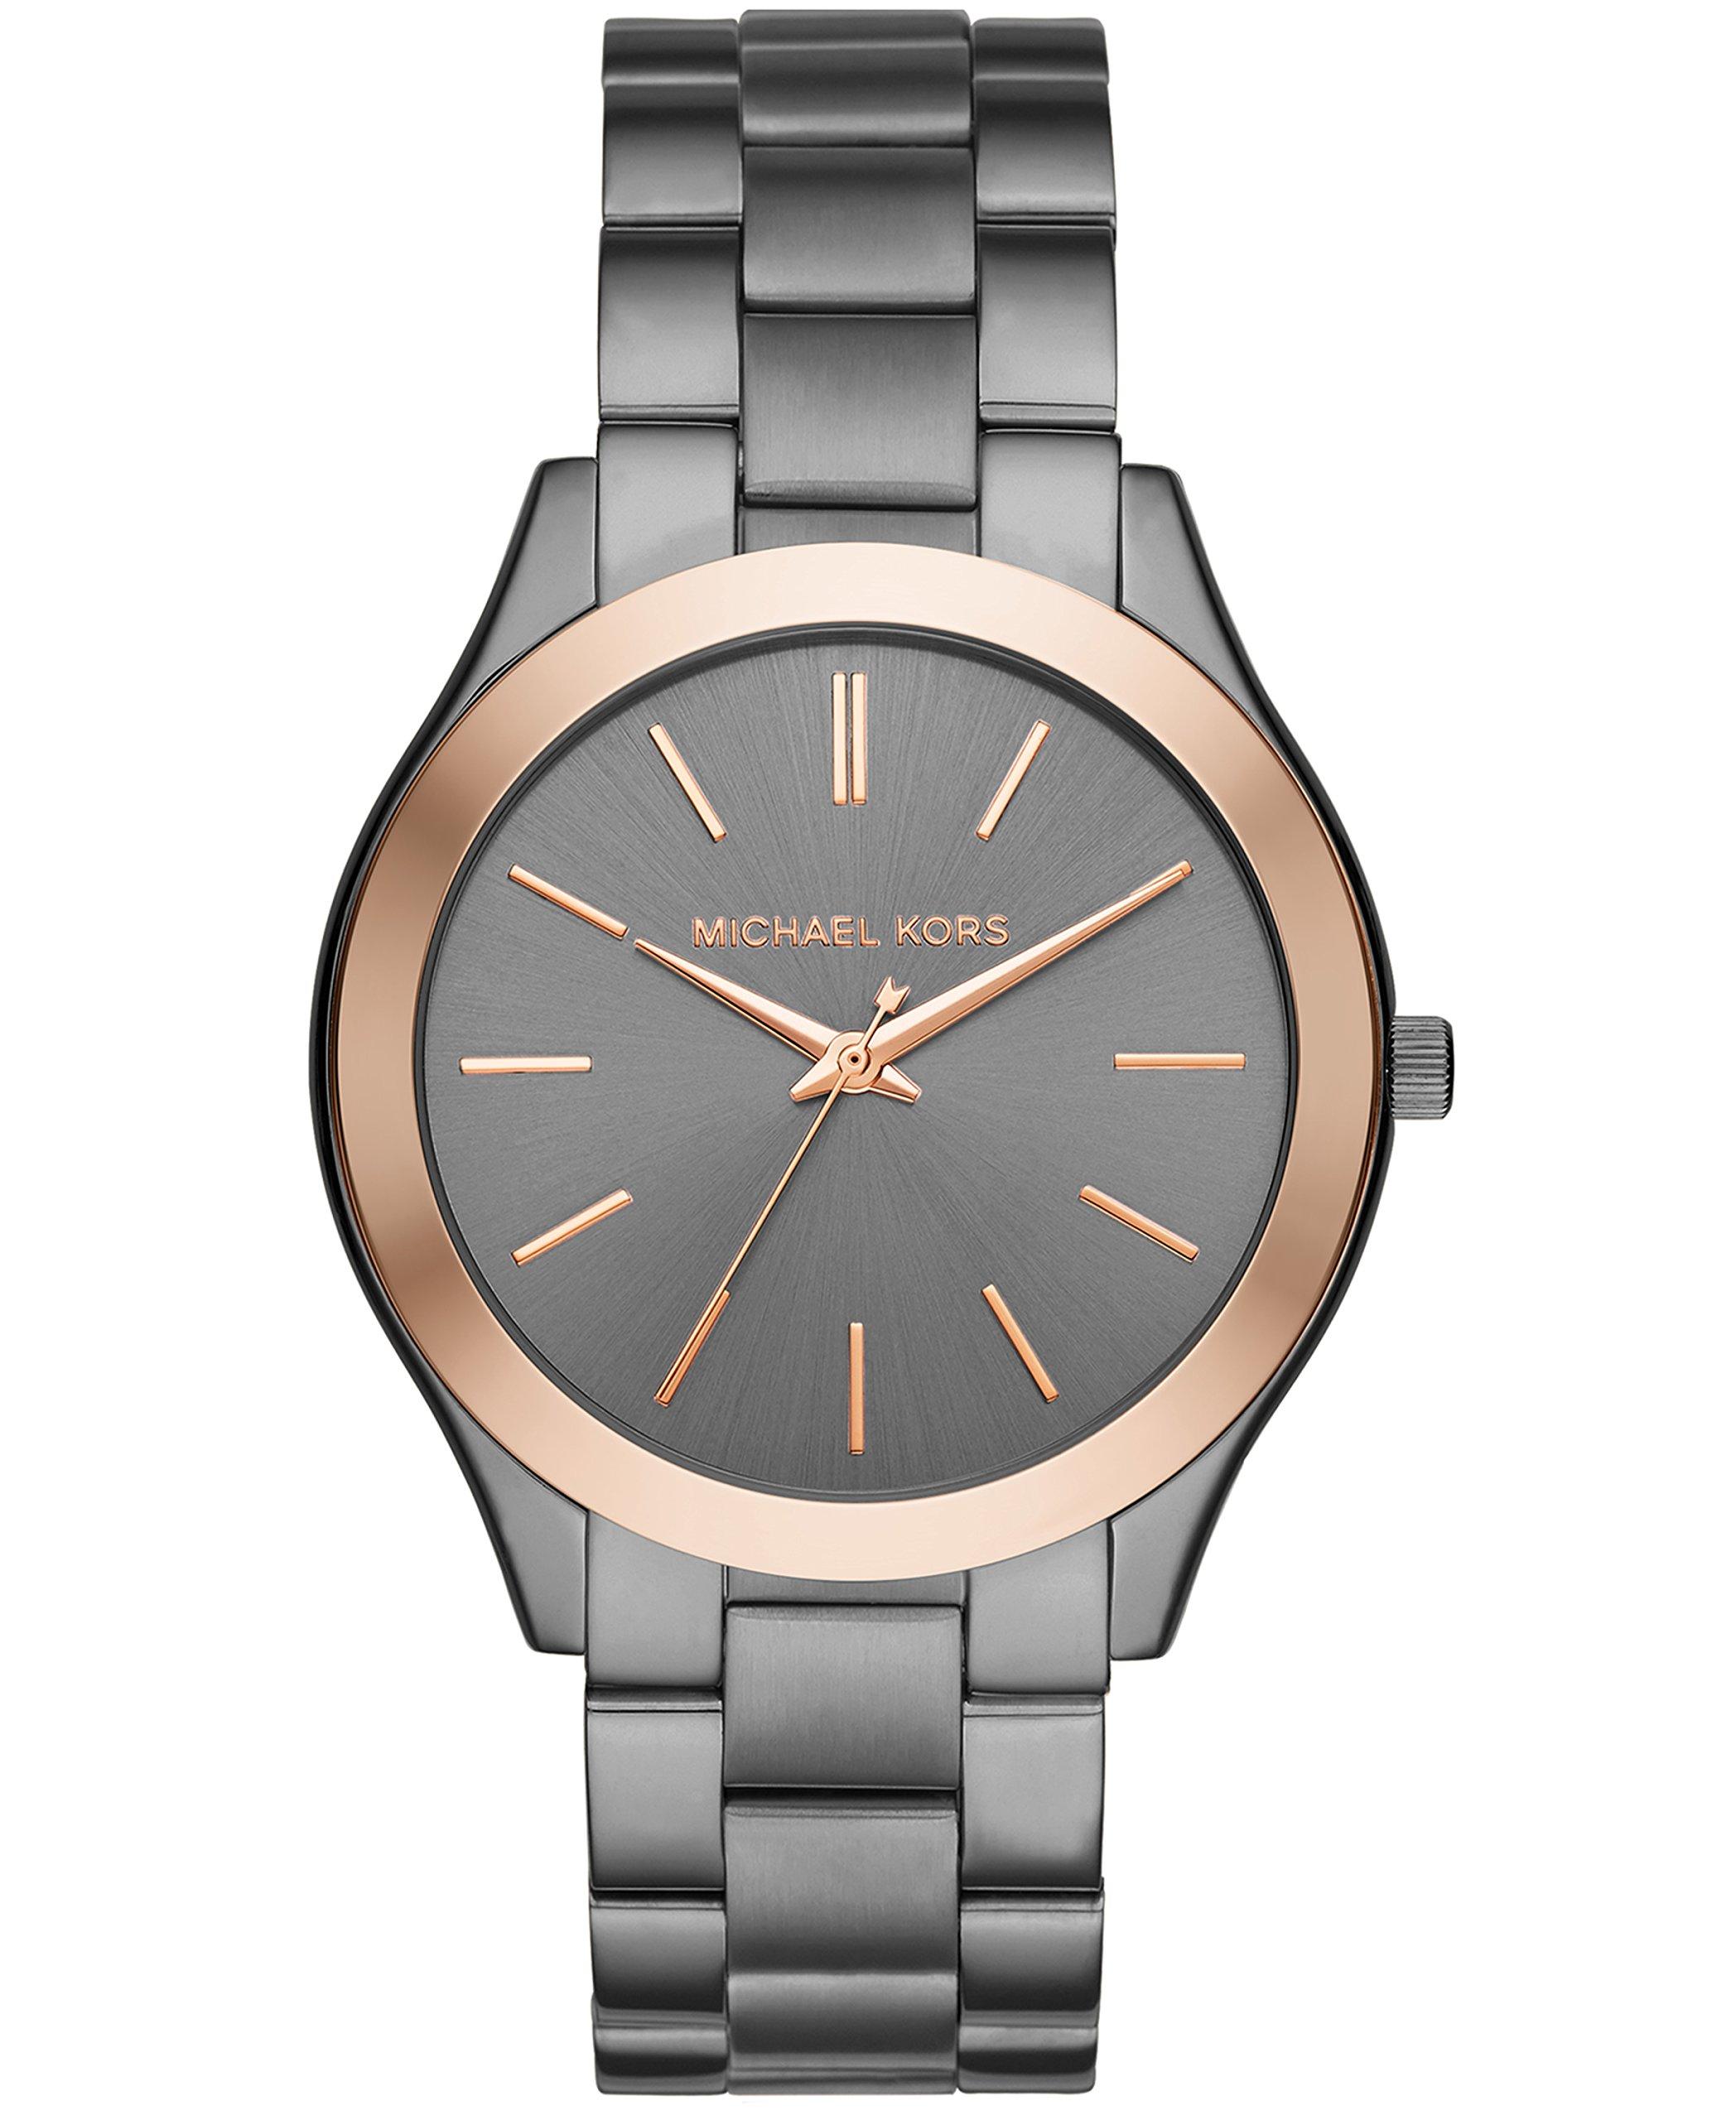 Michael Kors Men's Quartz Stainless Steel Casual Watch, Color:Grey (Model: MK8576)